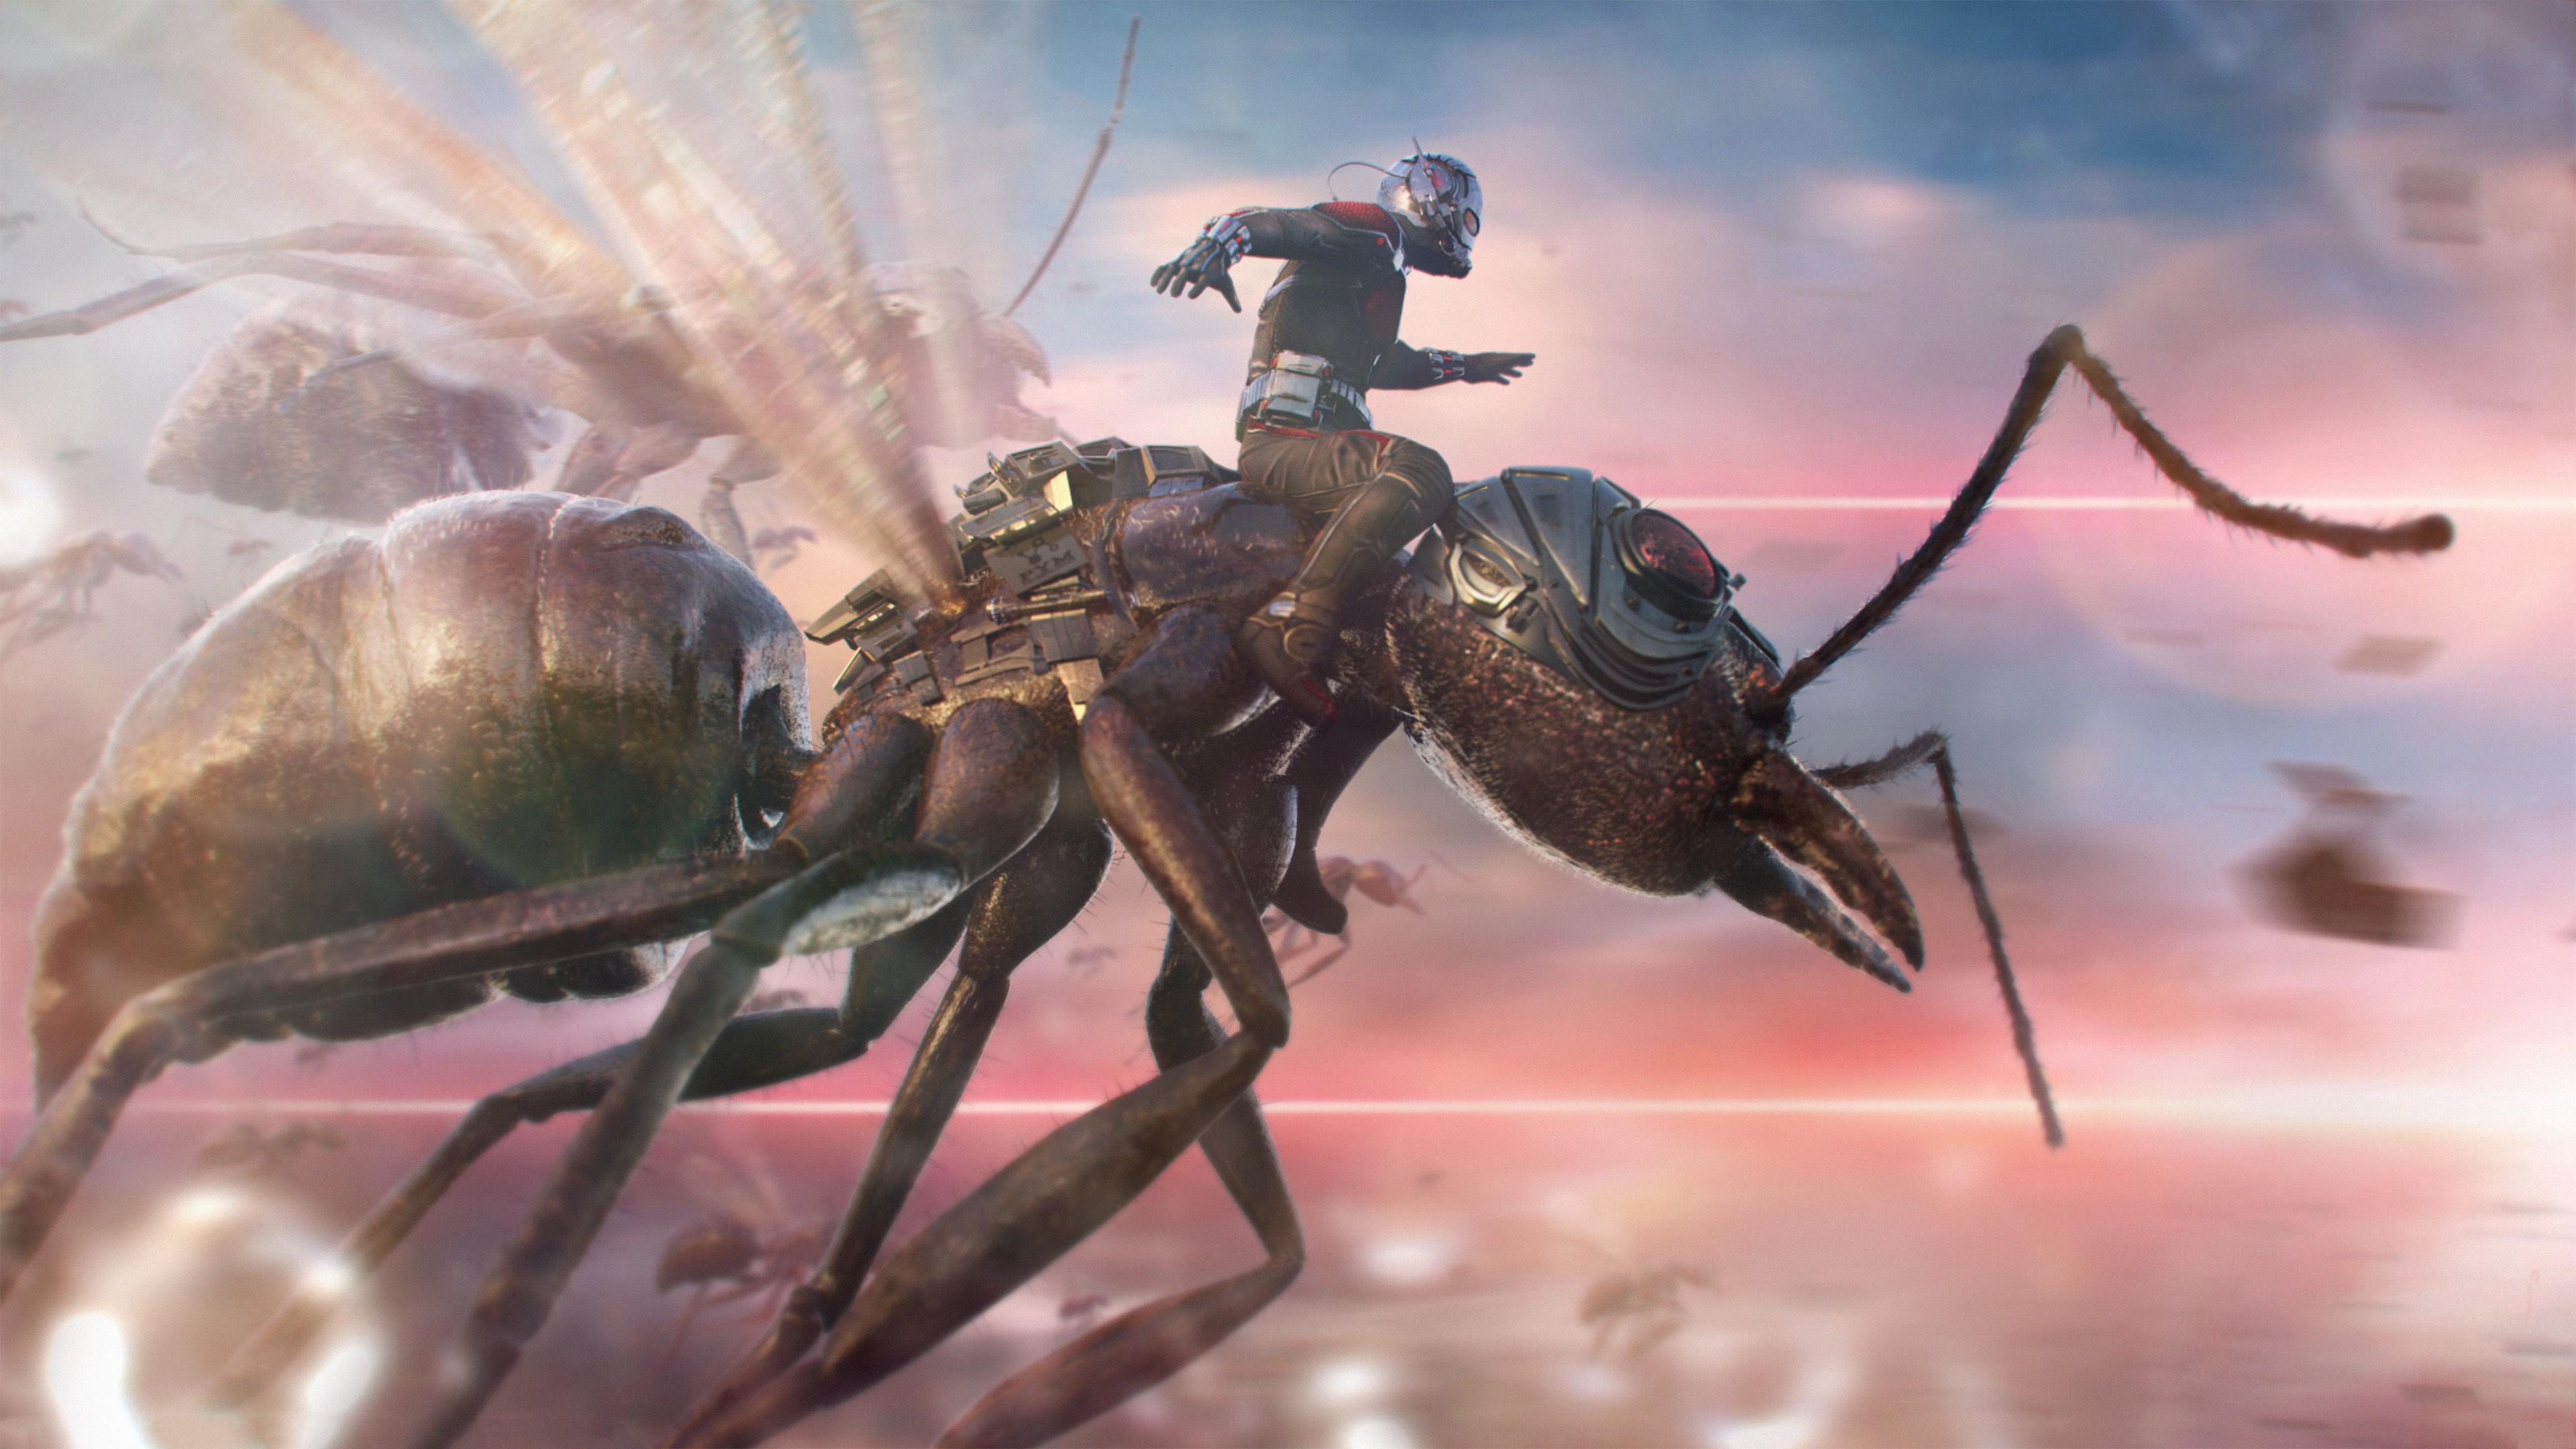 ant man illustration 5k 1537645932 - Ant Man Illustration 5k - superheroes wallpapers, hd-wallpapers, digital art wallpapers, artwork wallpapers, artstation wallpapers, artist wallpapers, ant man wallpapers, 5k wallpapers, 4k-wallpapers